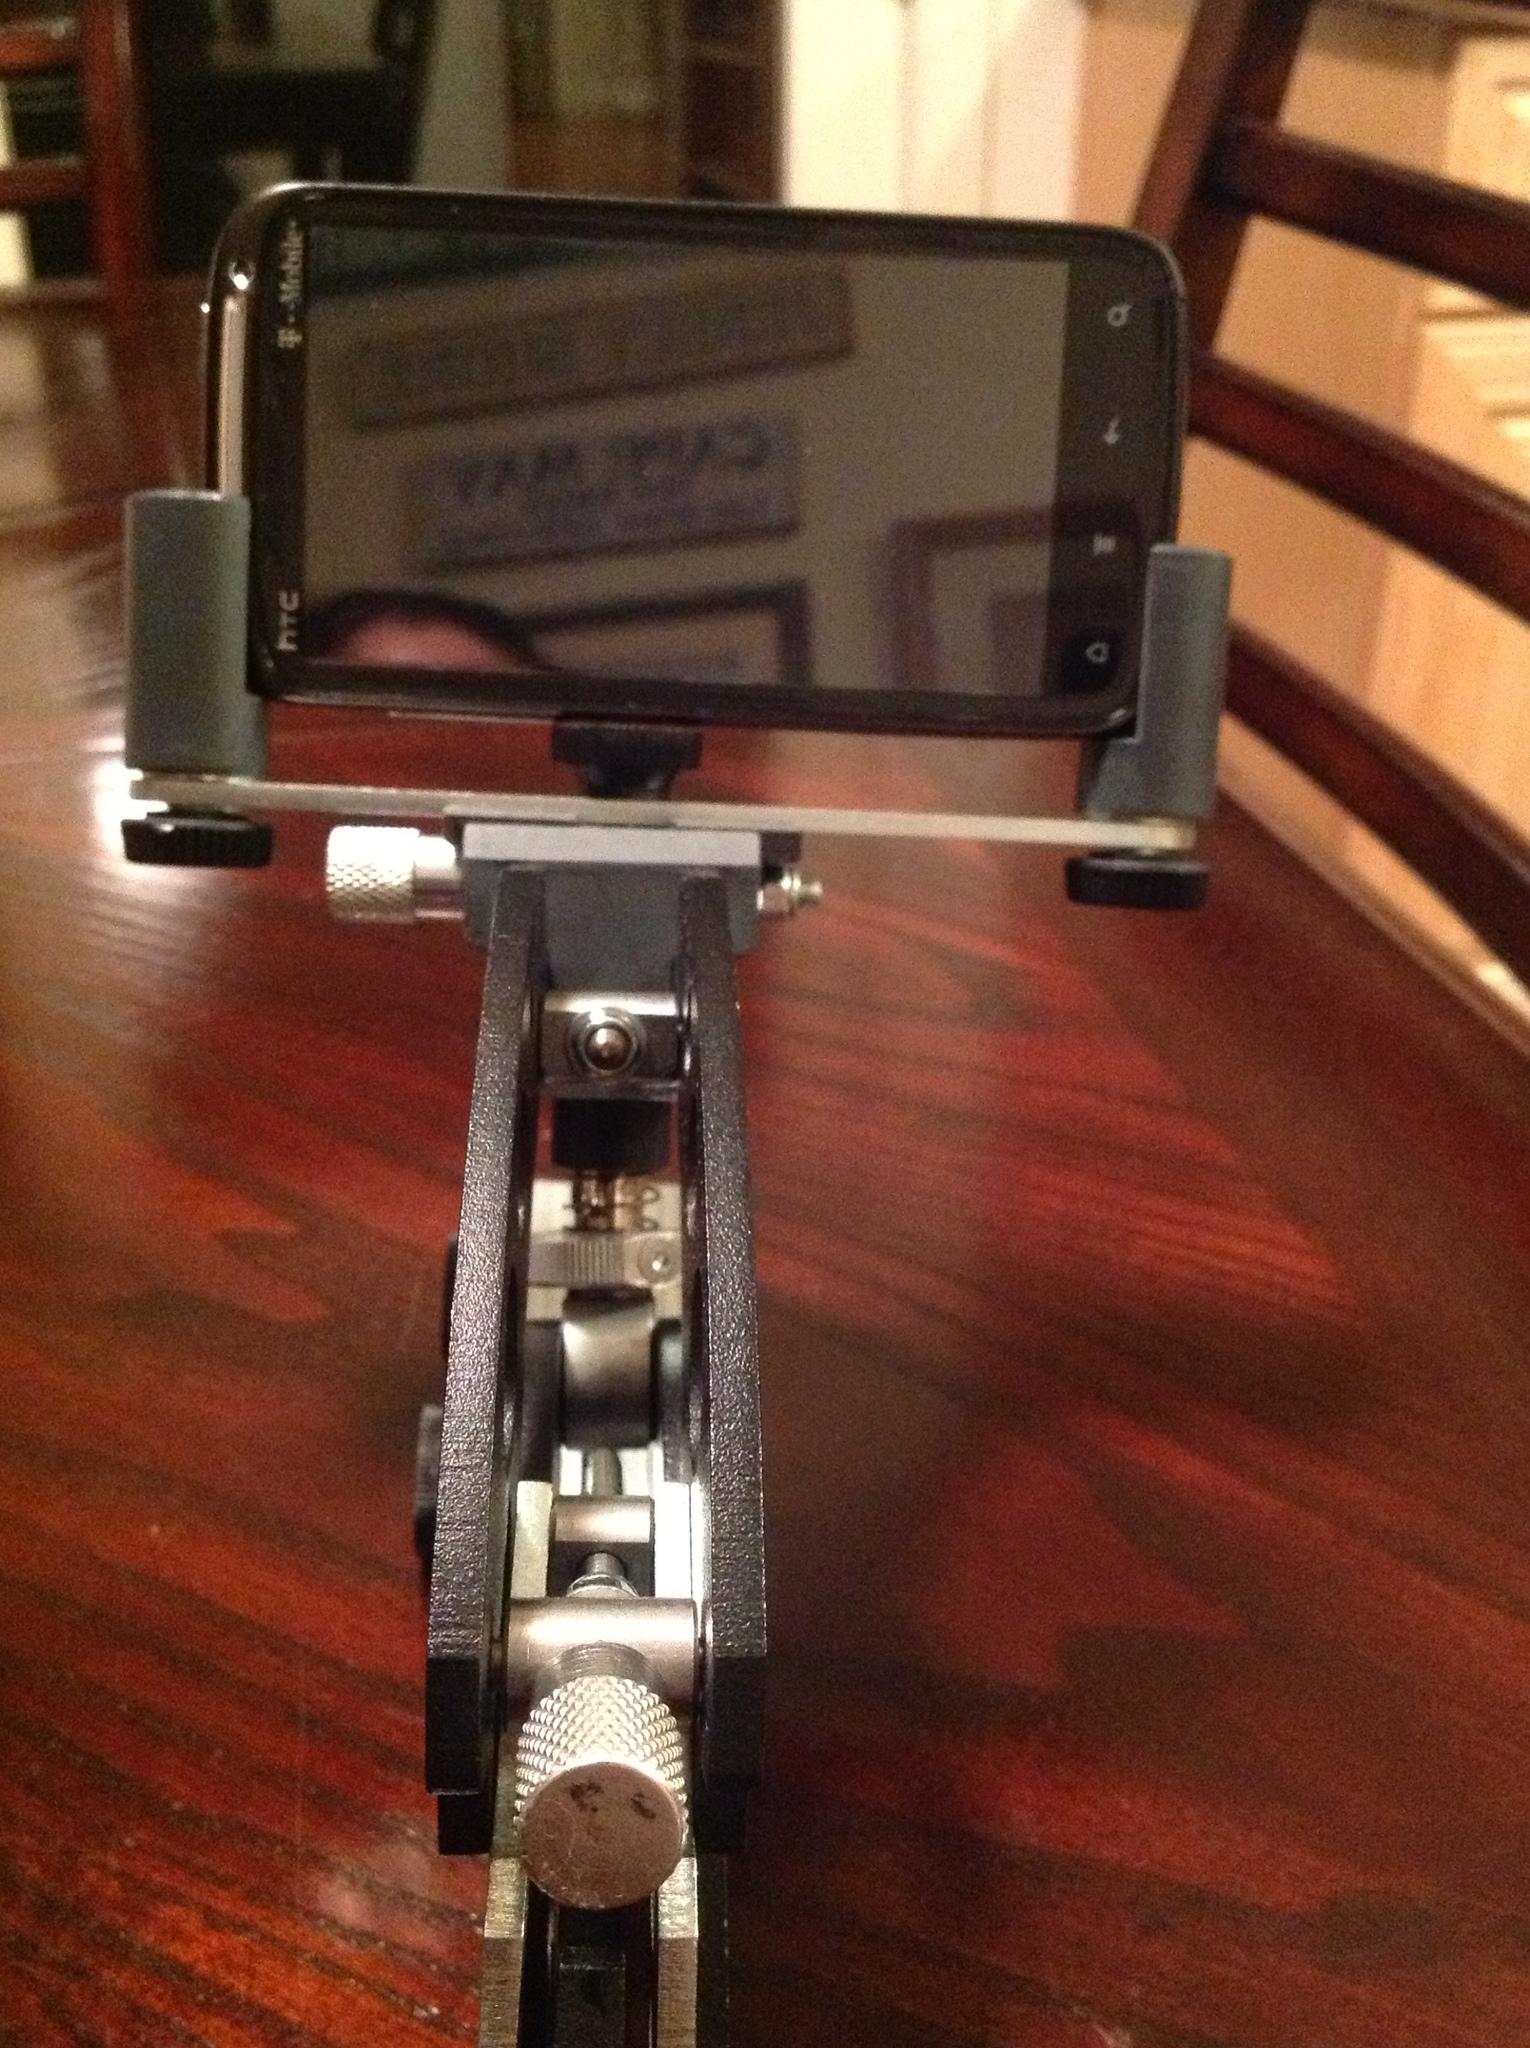 Photography Gear Misc Gear iPhone Gear   Photography Gear Misc Gear iPhone Gear